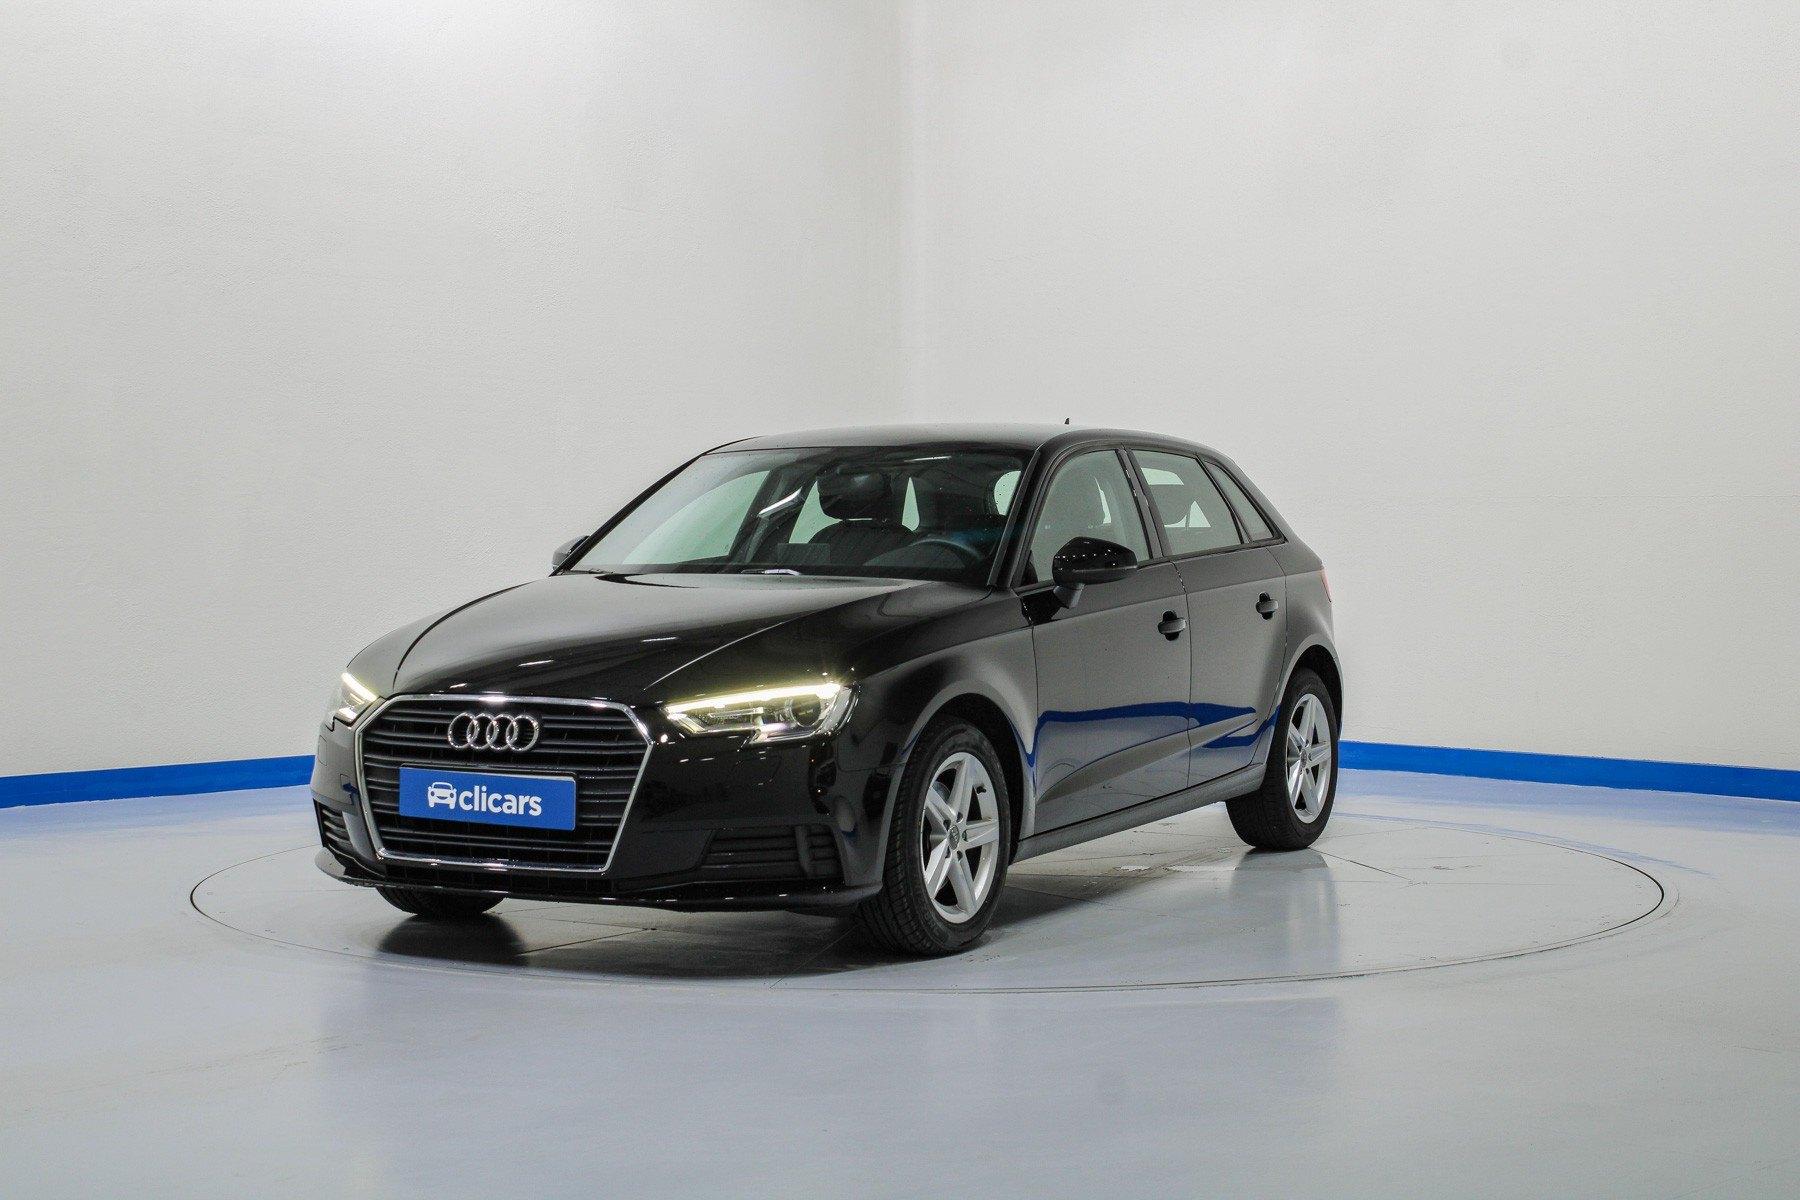 Audi A3 Gasolina 30 TFSI 85kW (116CV) Sportback 1